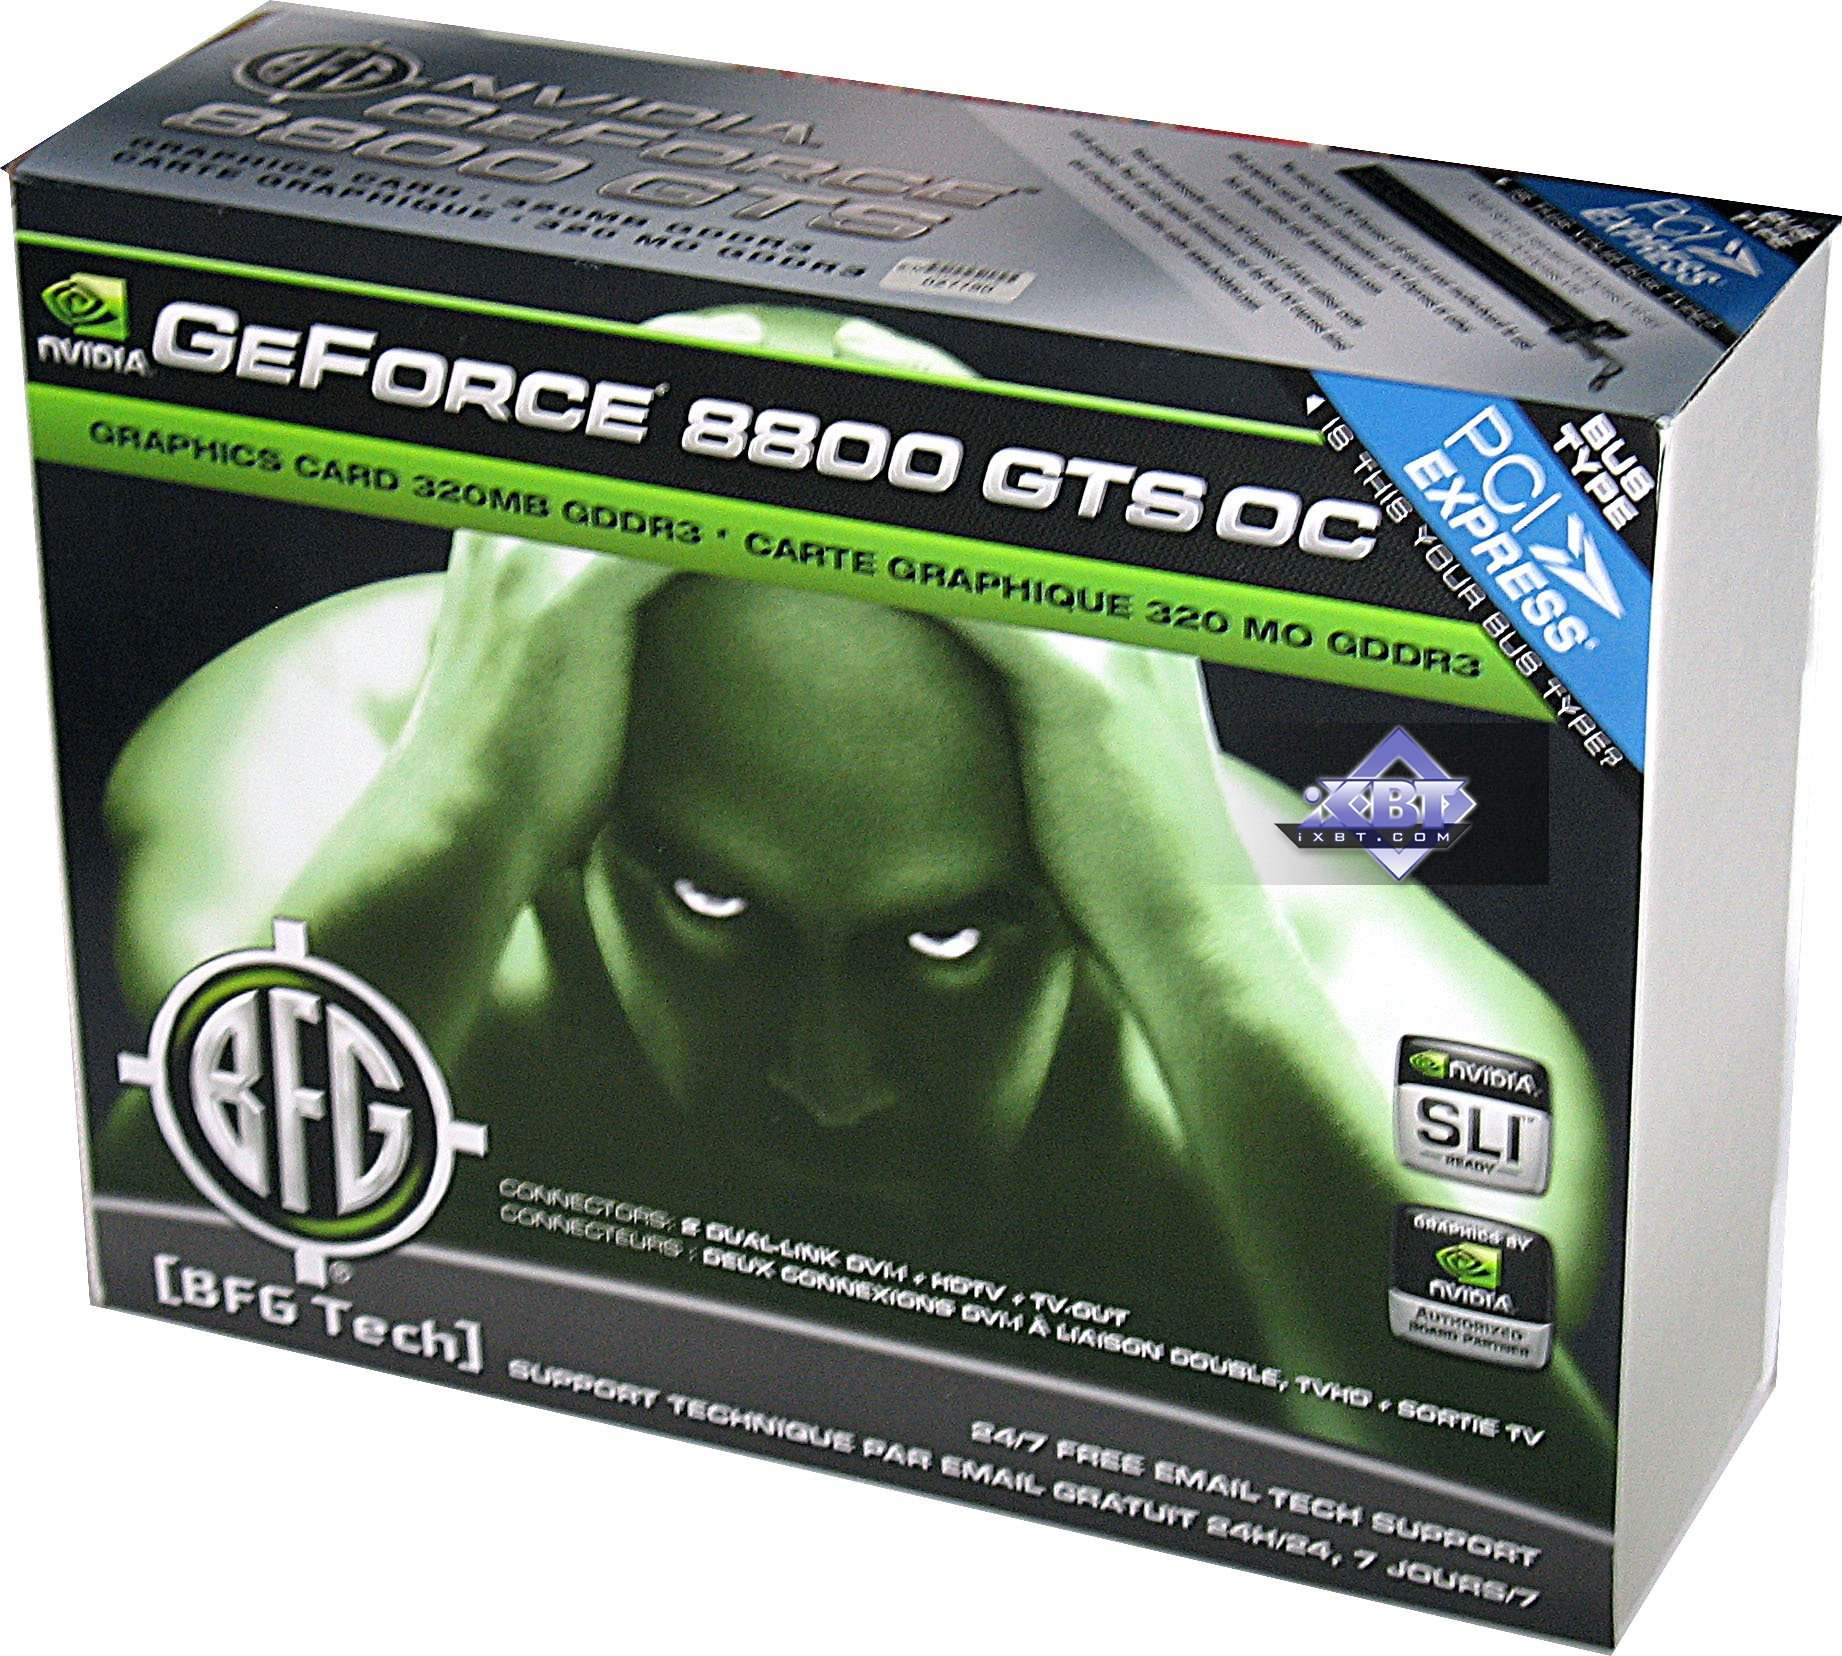 BFG GeForce 8800 GTS Overclocked 320MB PCI E